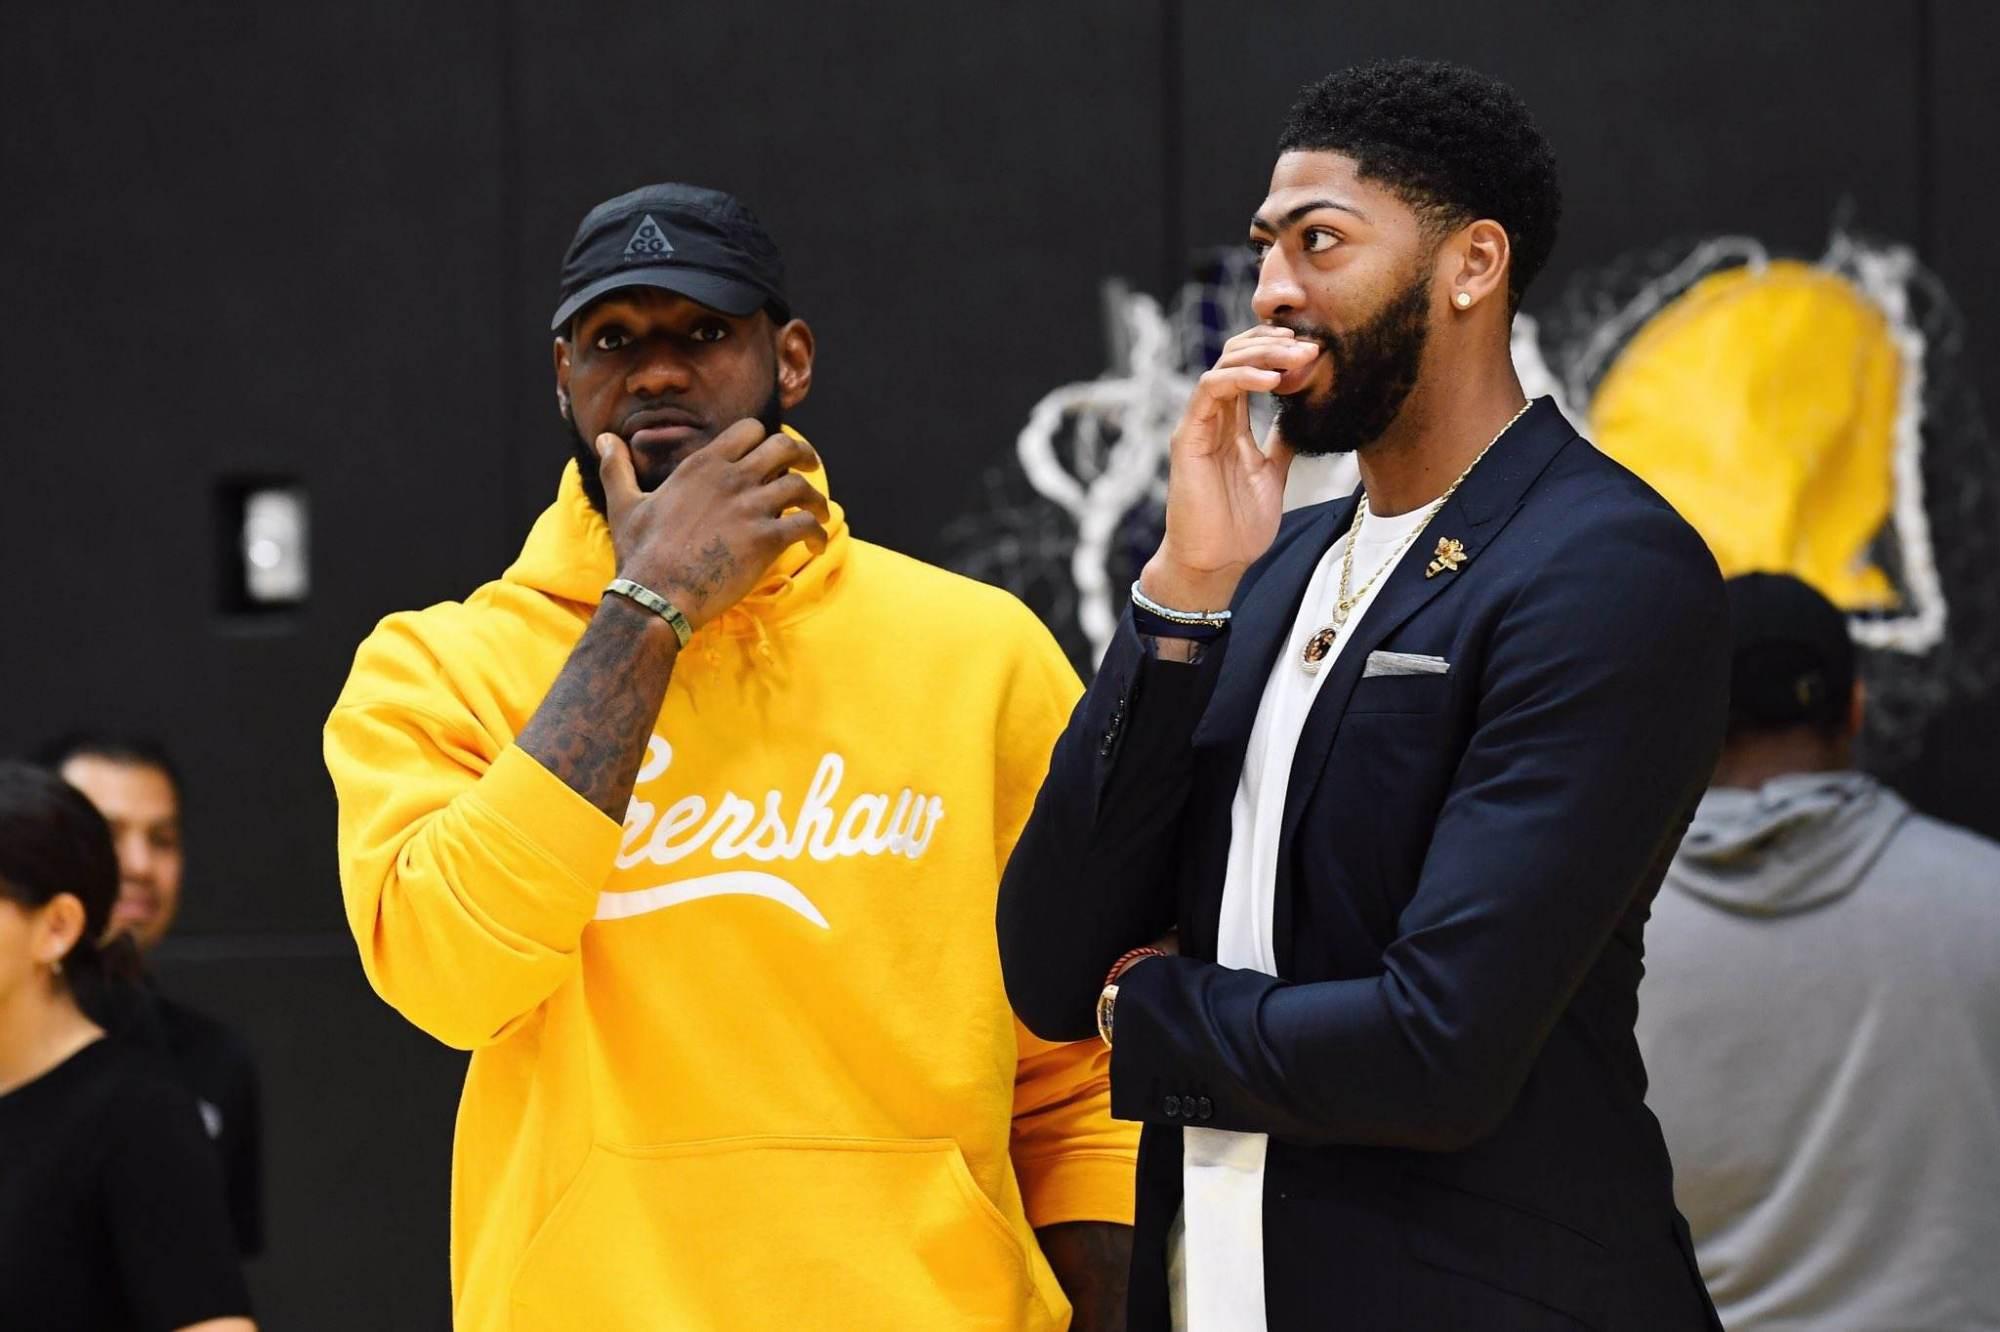 NBA史上最强粉丝?戴维斯自幼一路追随詹姆斯 